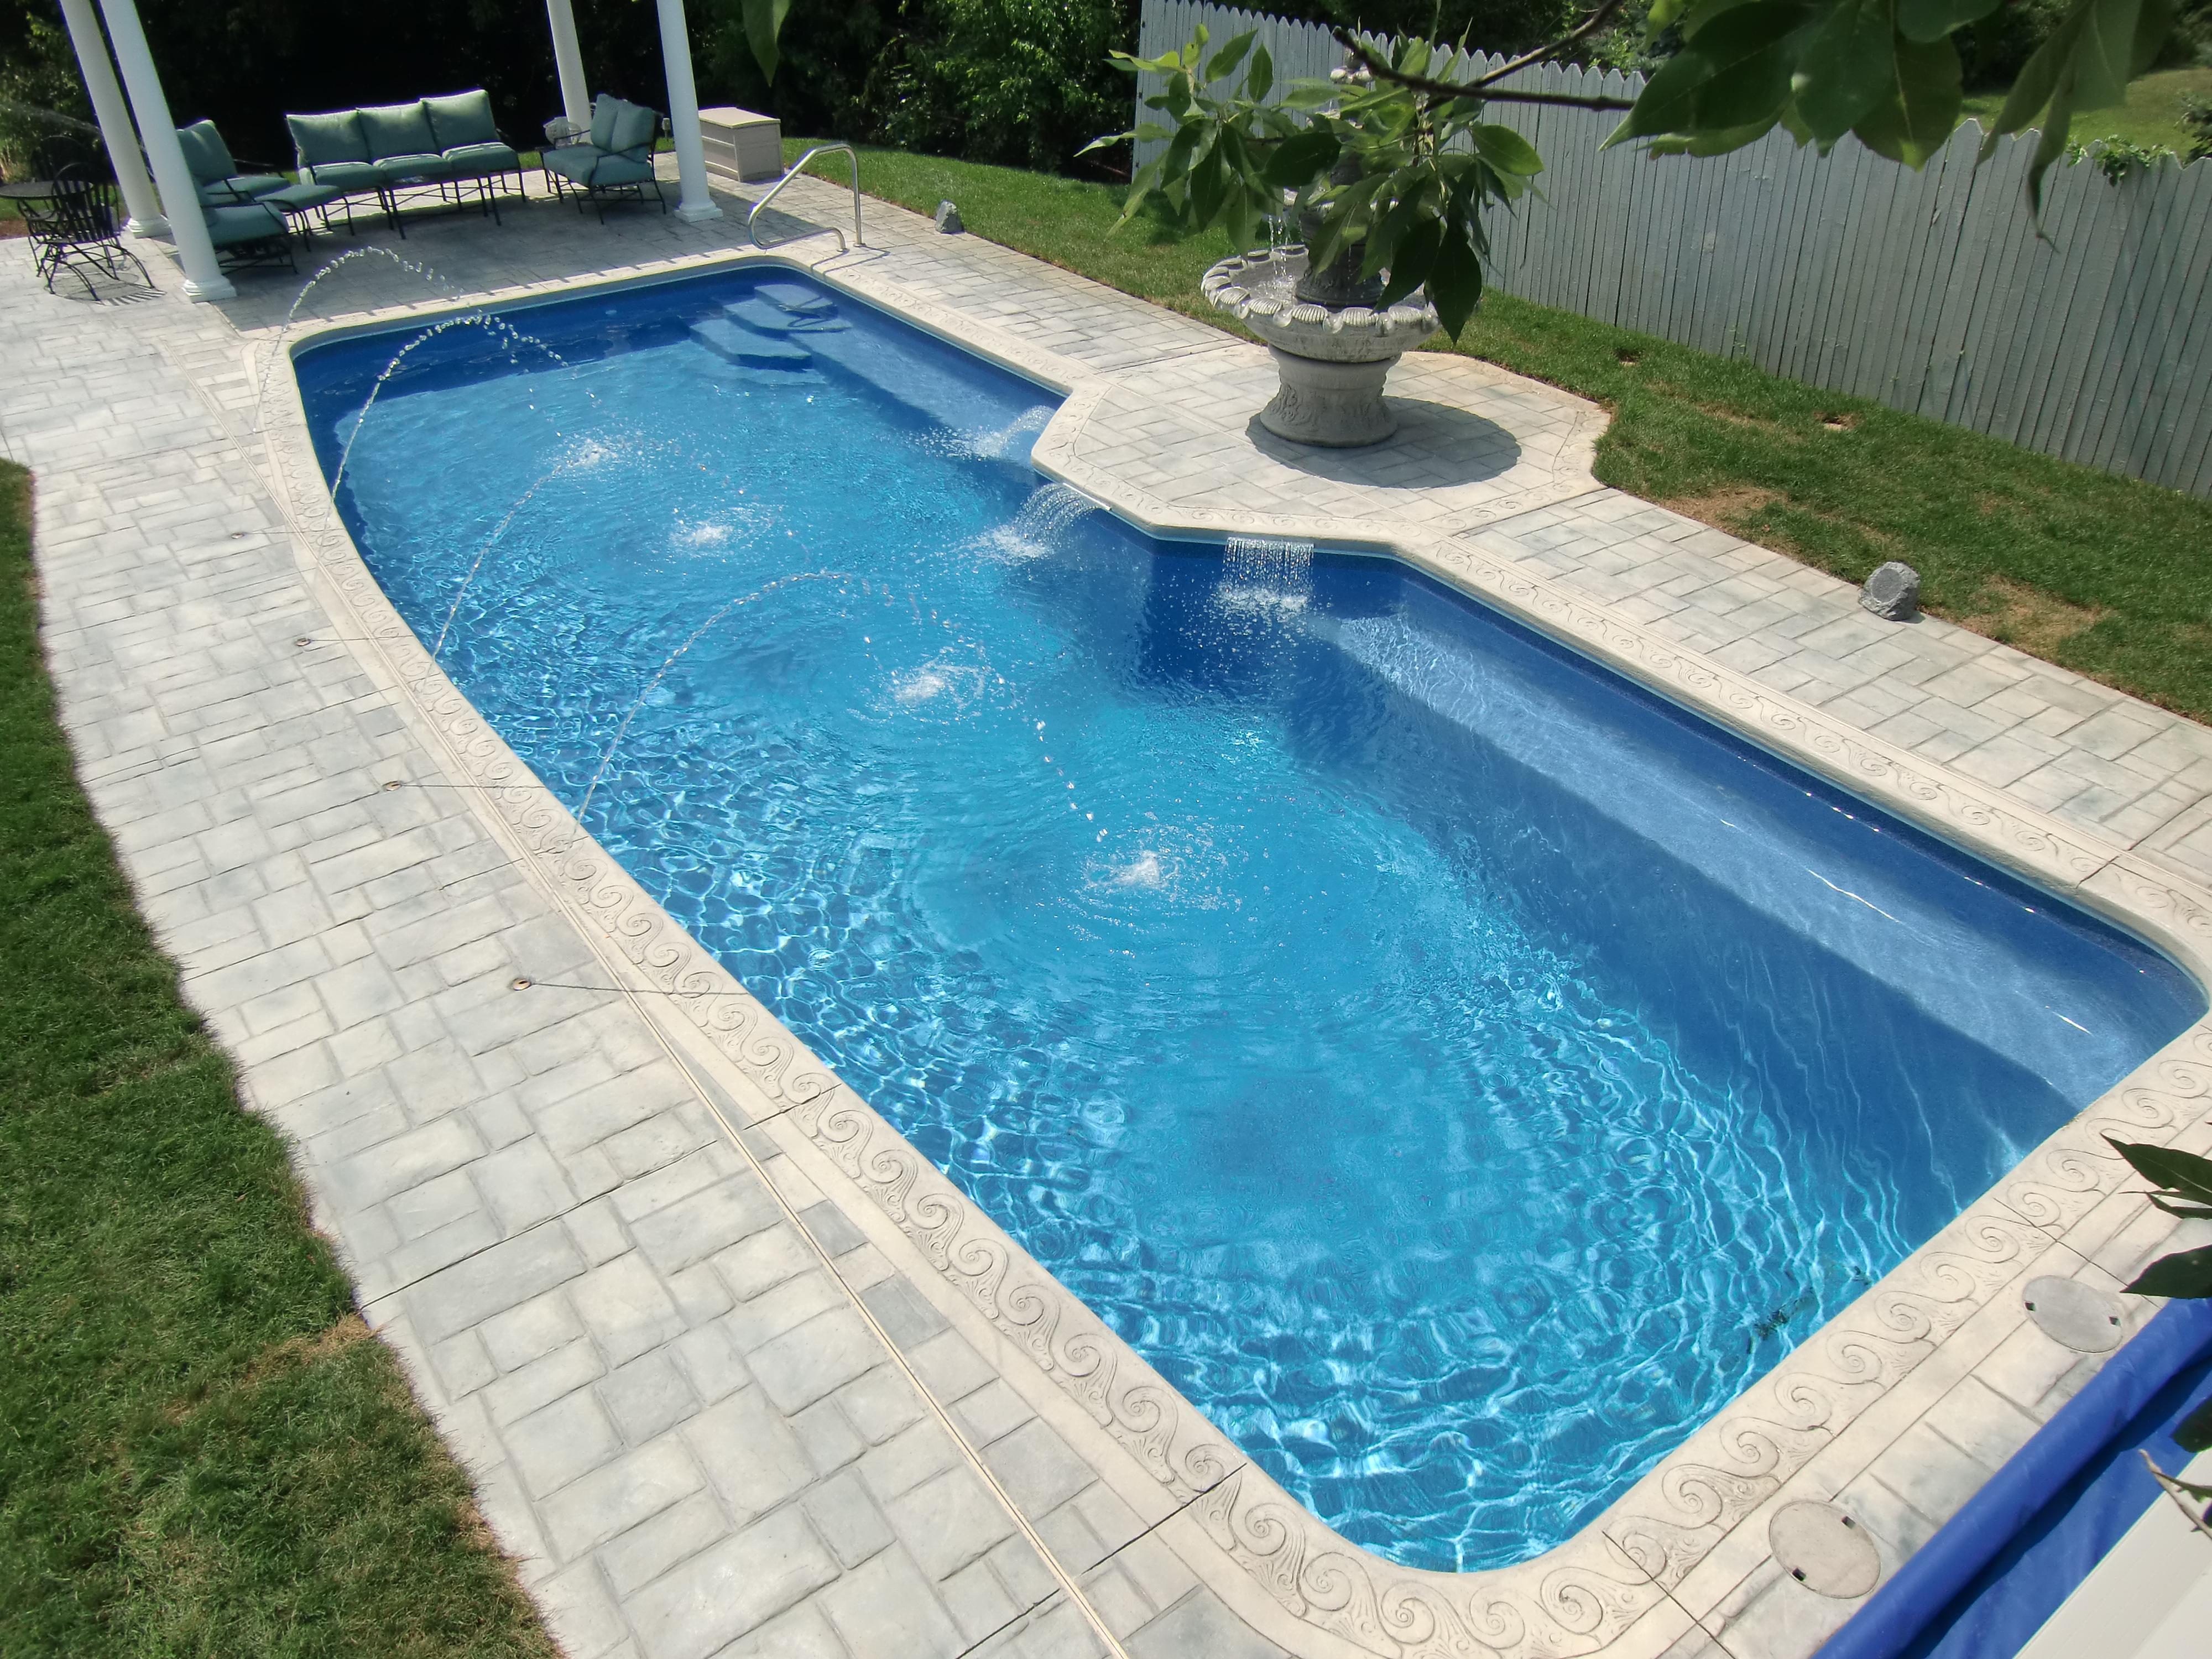 Swimming pool fibreglass ideas homesfeed for Pool design 2015